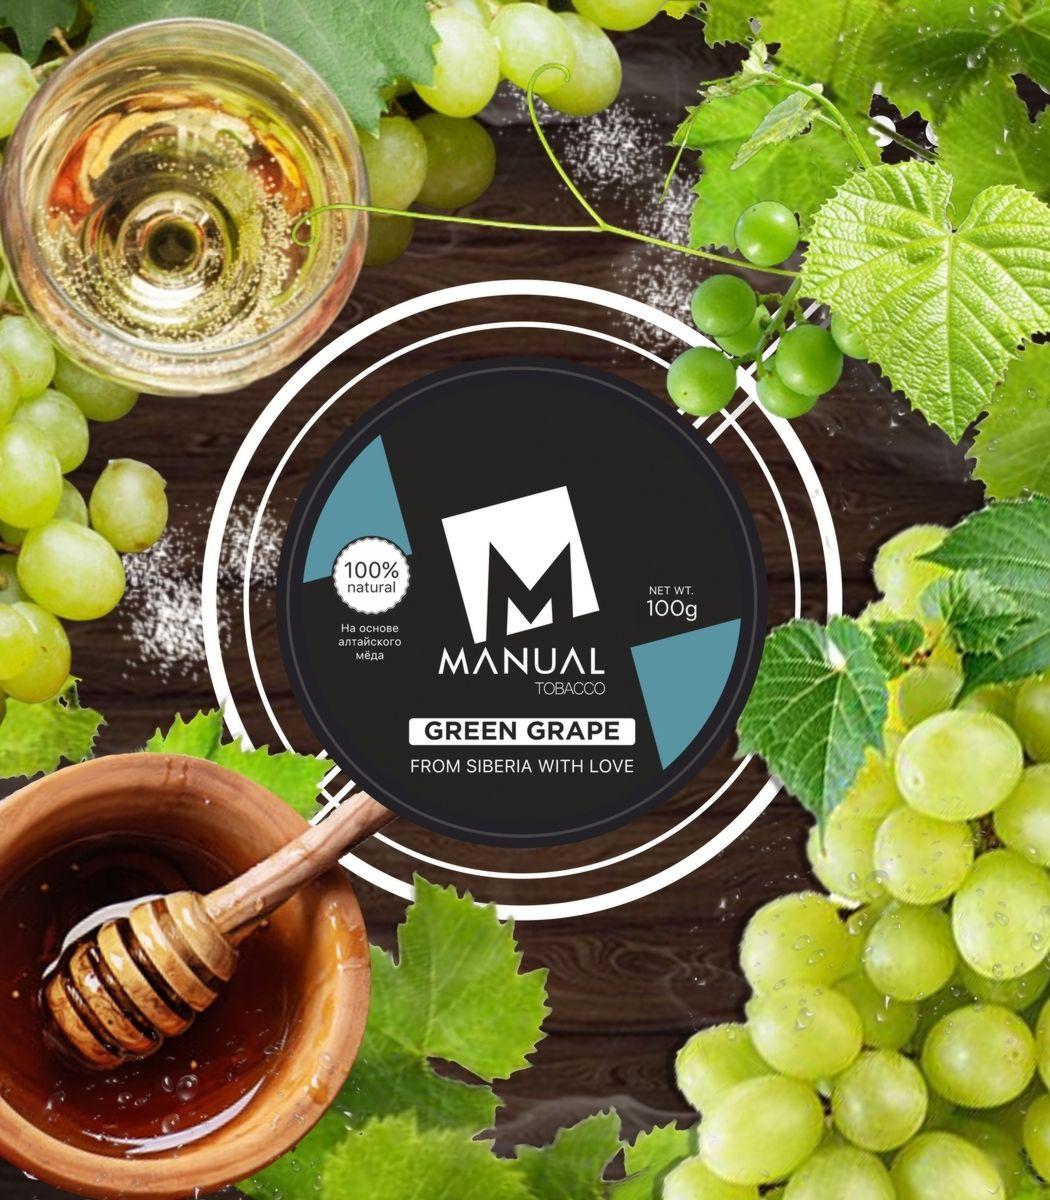 Manual синий Зеленый виноград